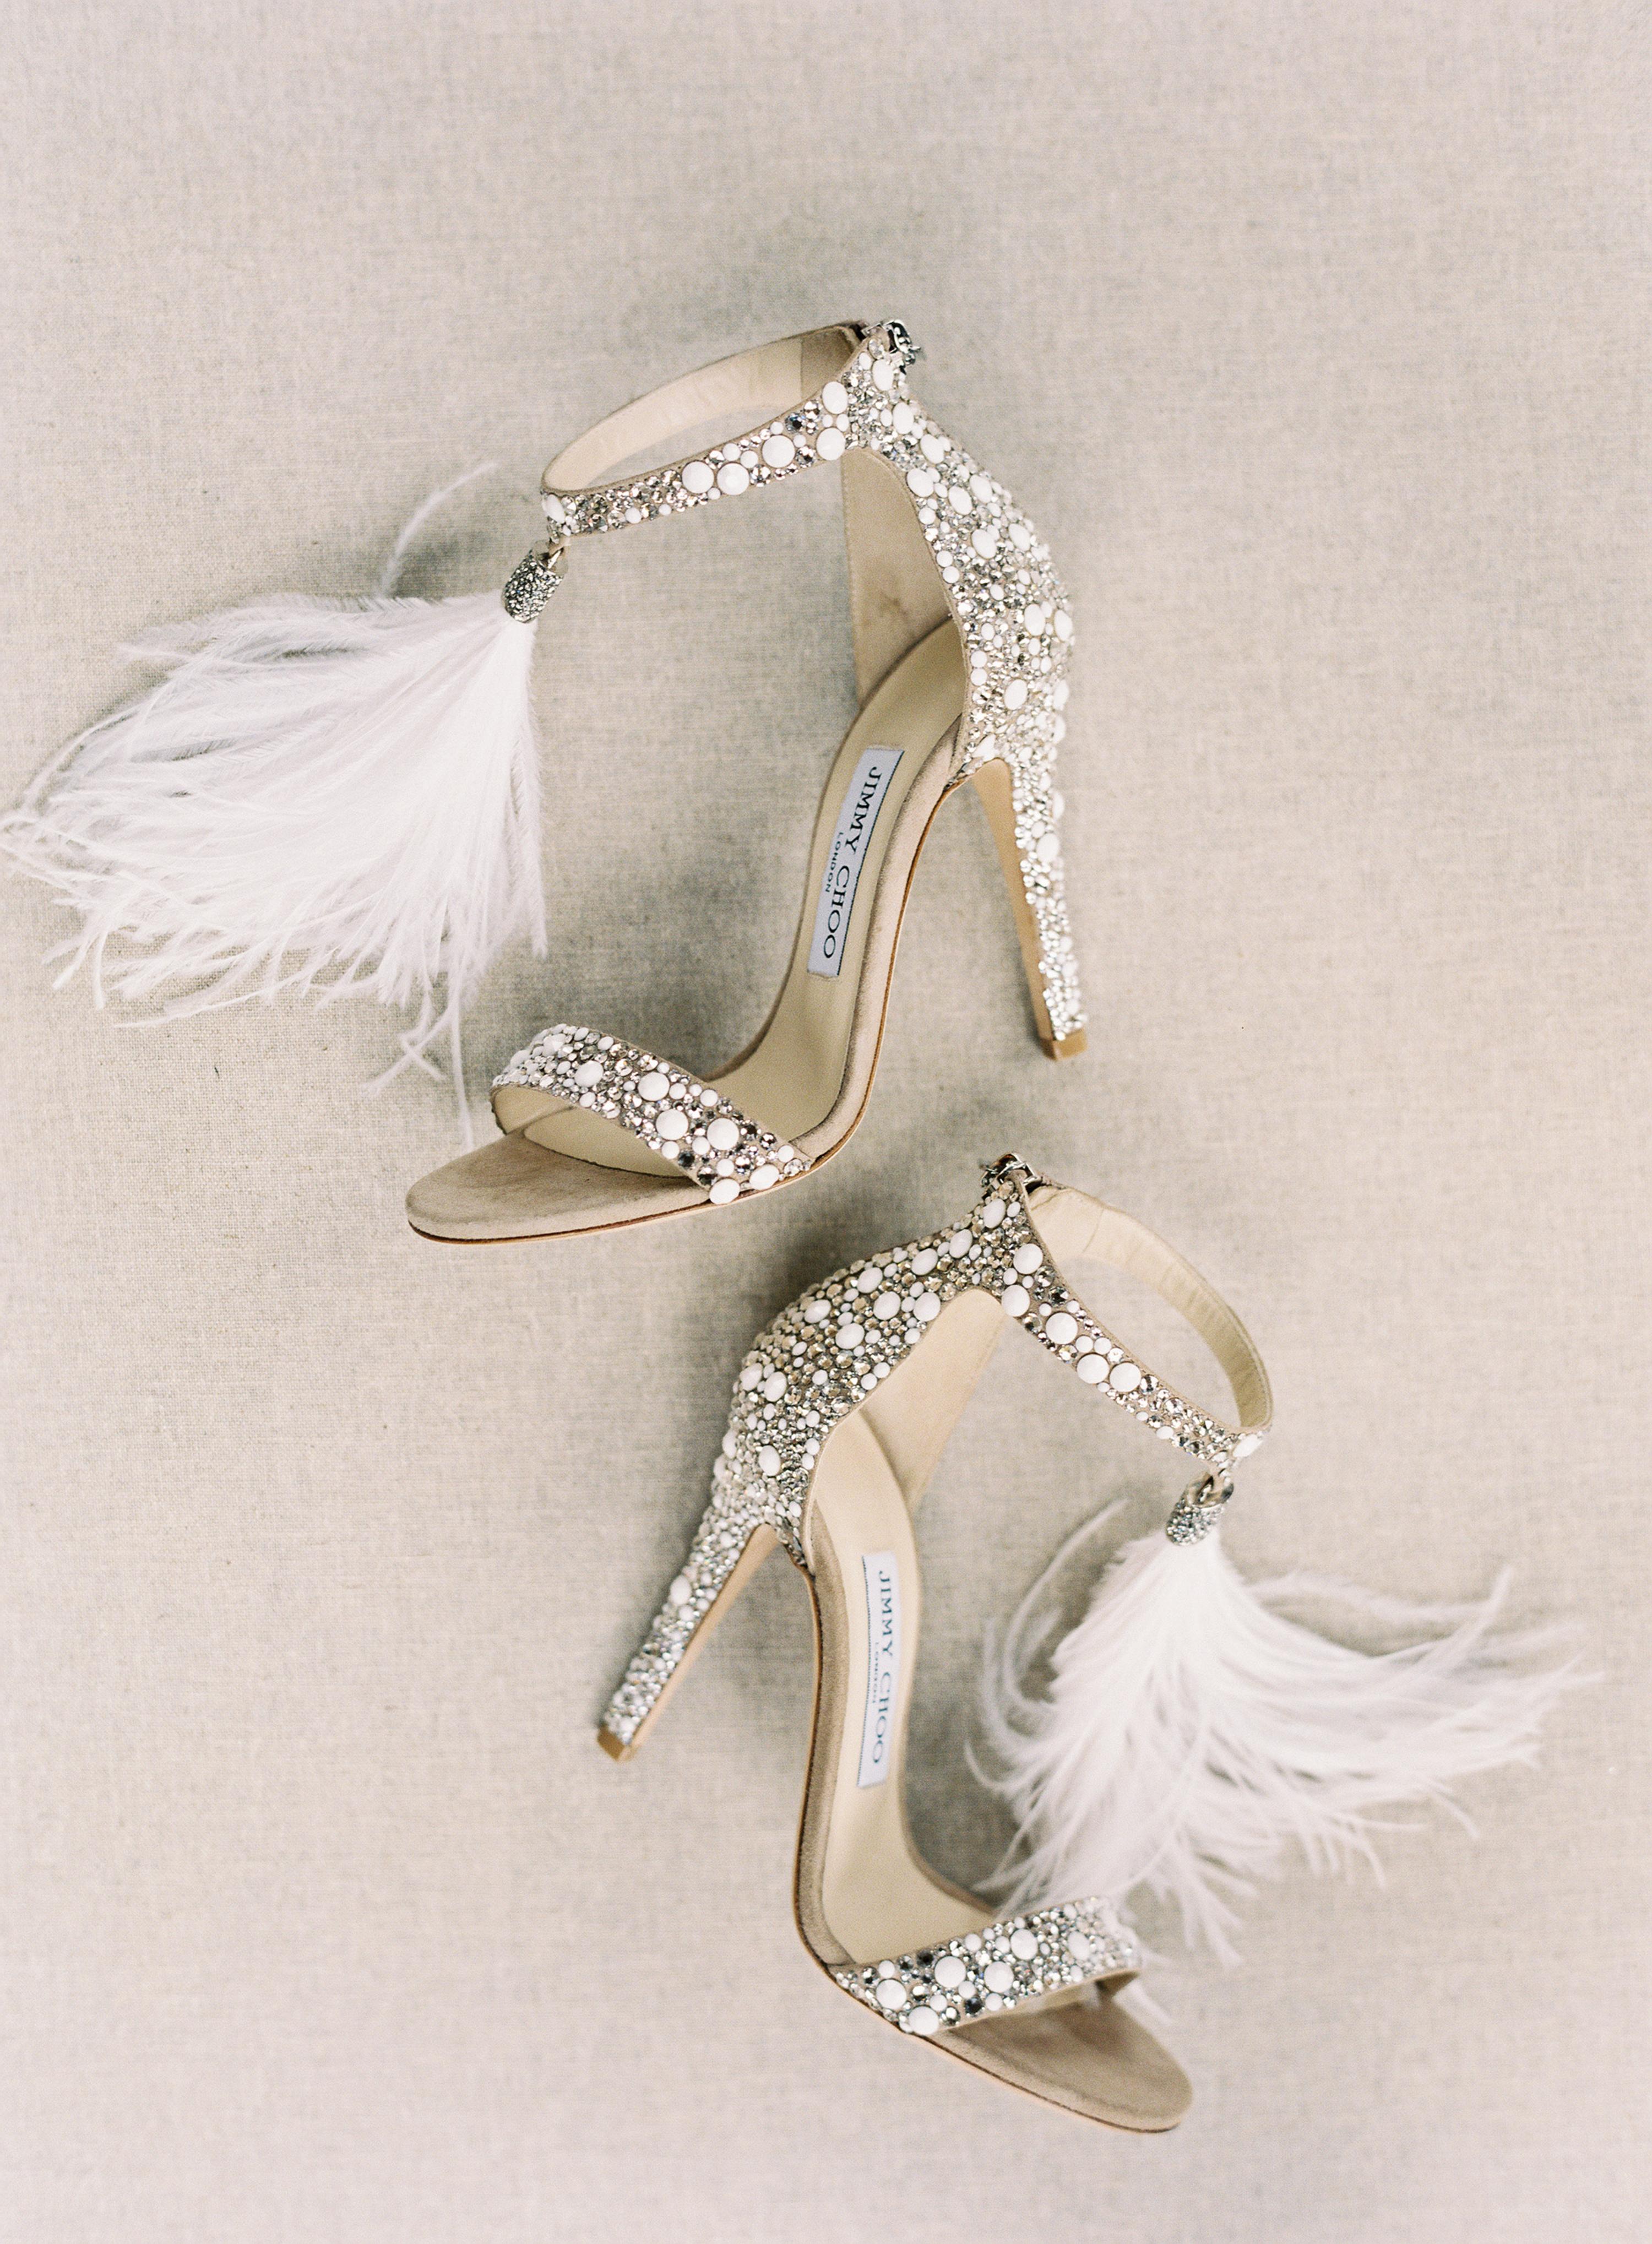 Athenaeum_Wedding_Hi_Res-1-Jen_Huang-005194-R1-012